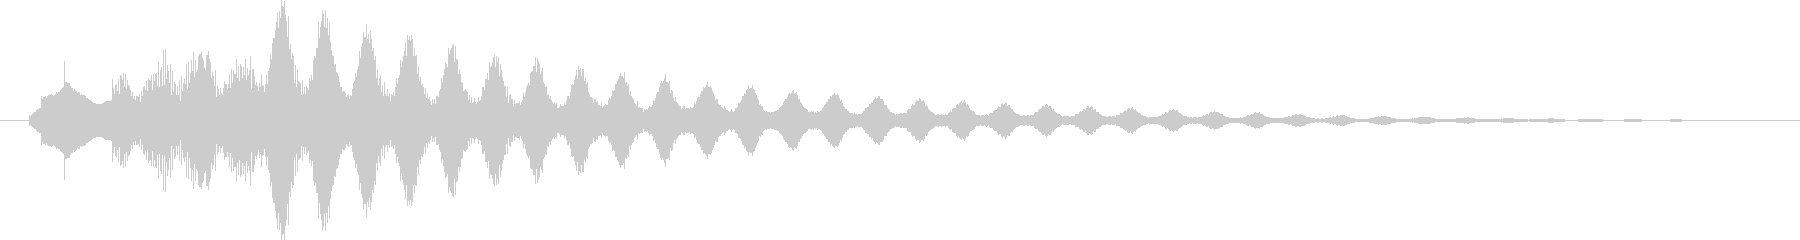 Vibraphone:ネットワーク...の未再生の波形